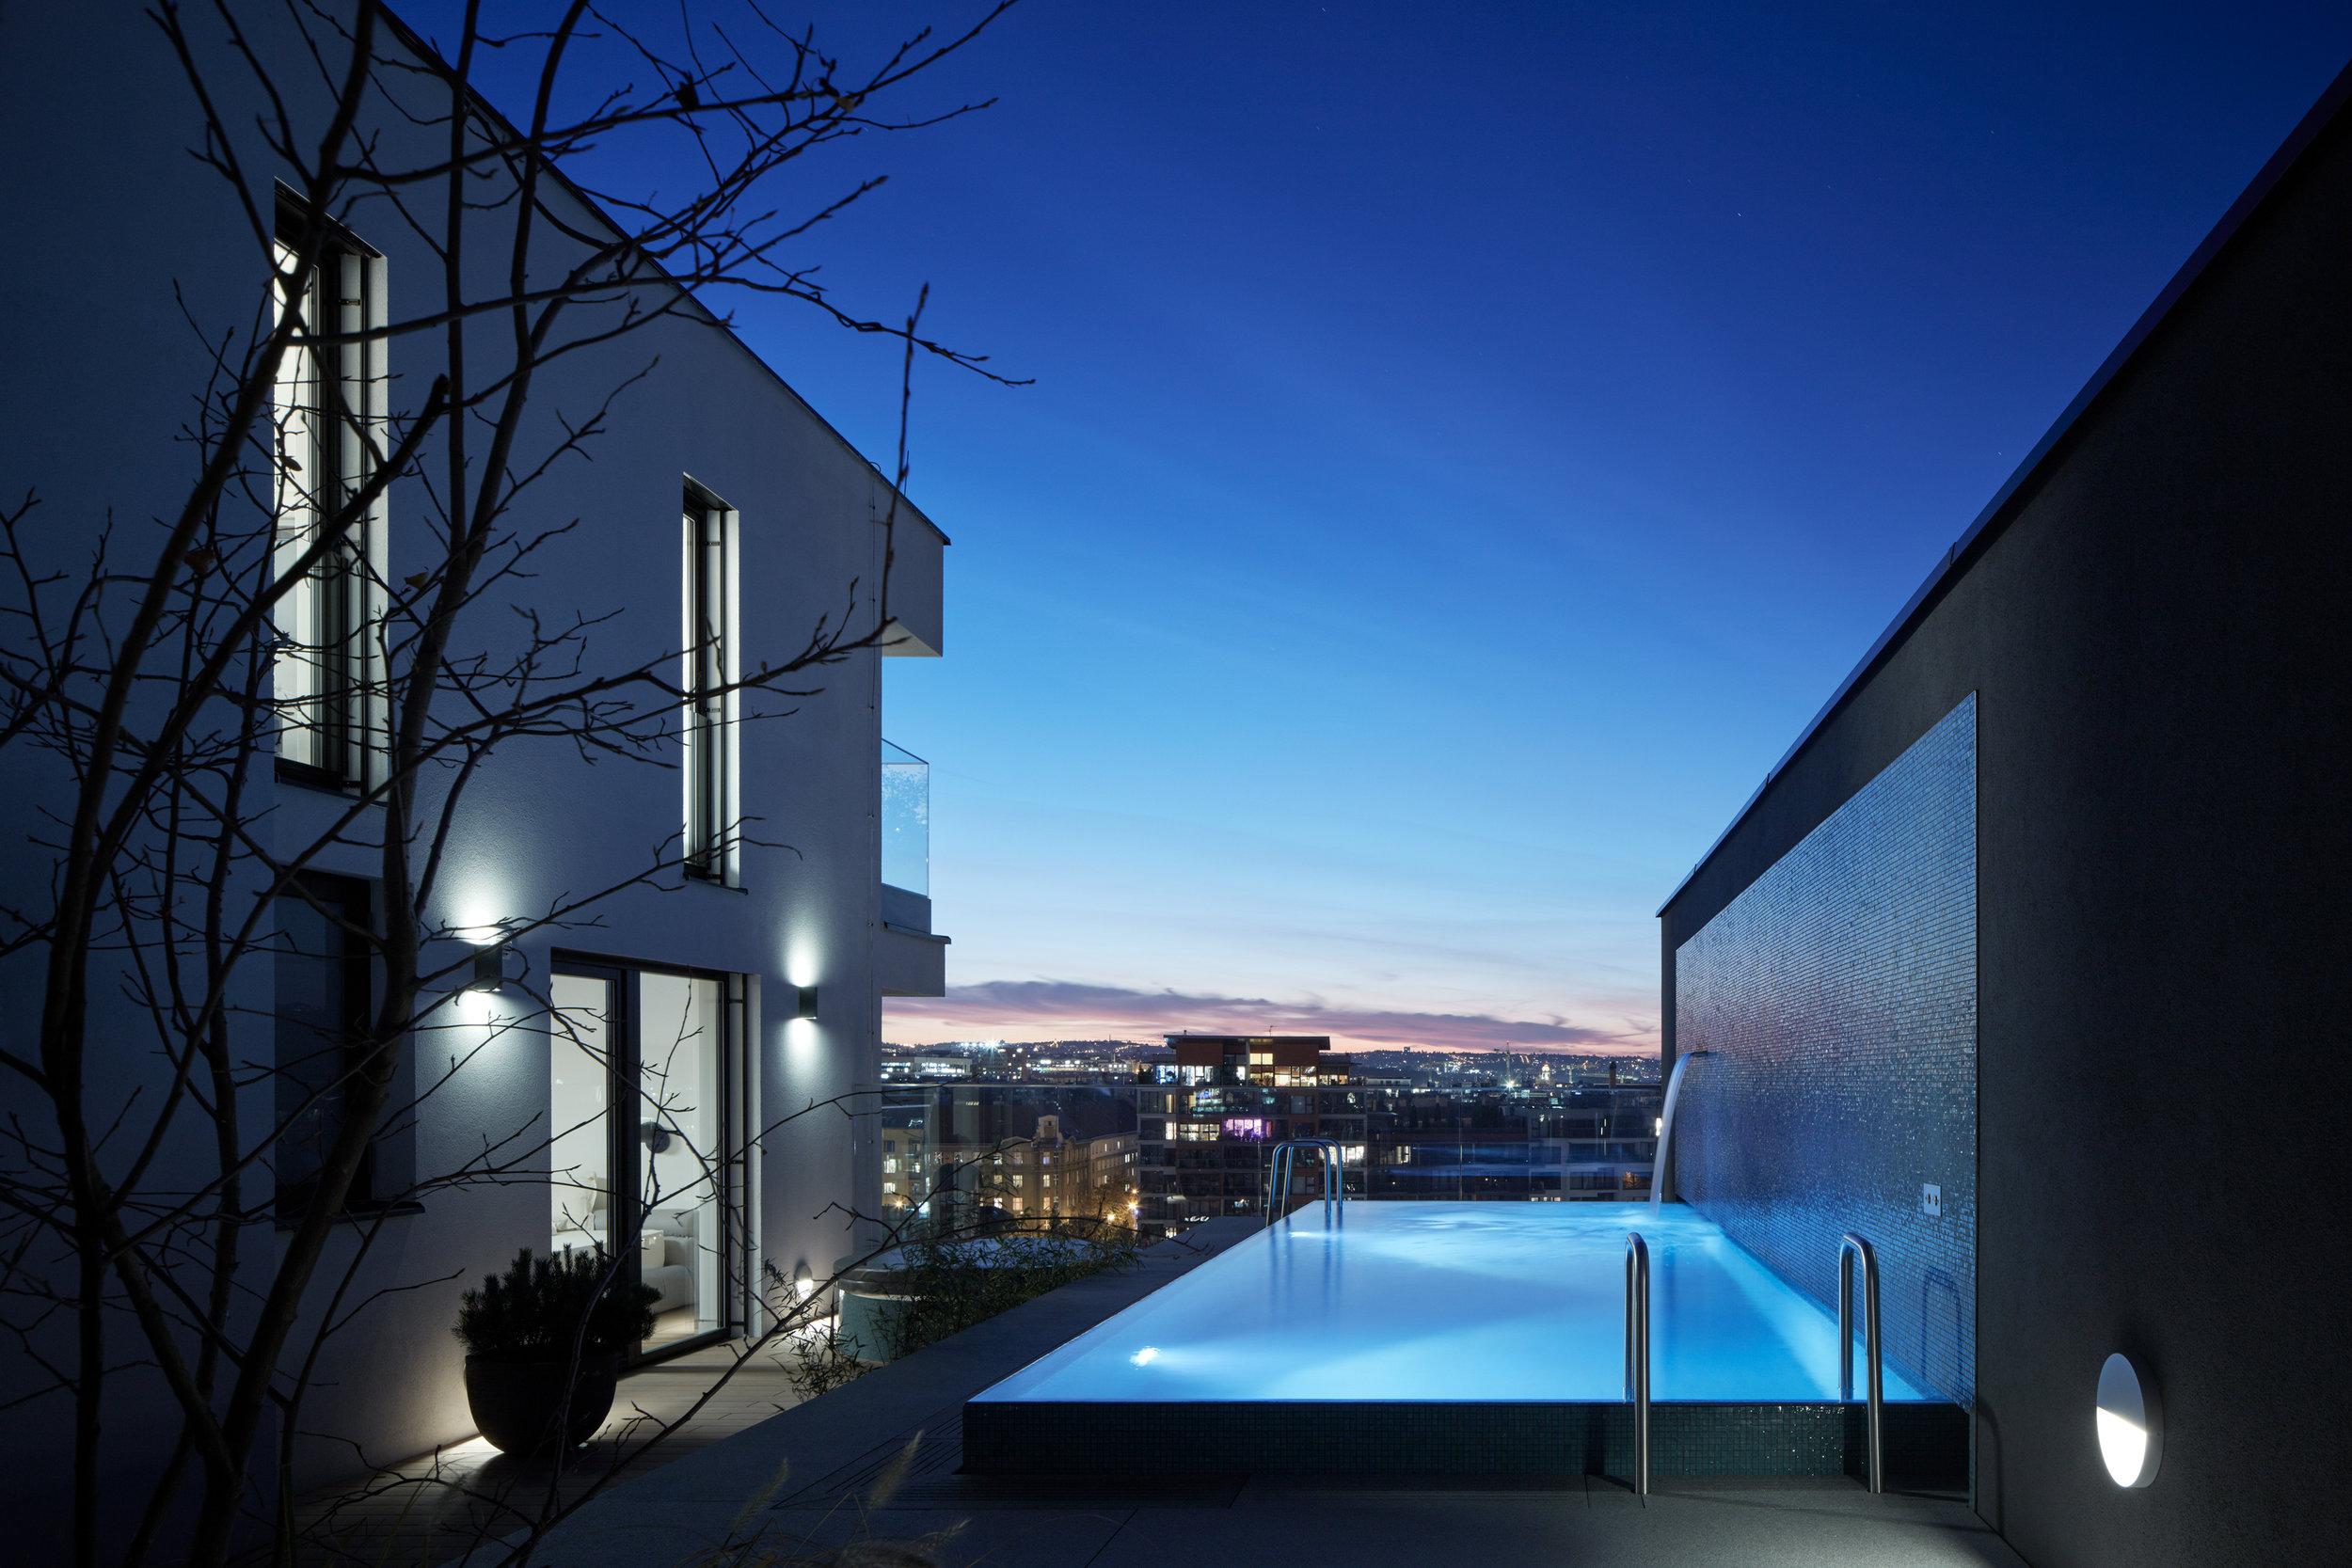 Go_Architects_Marina_Island_BoysPlayNice_17.jpg